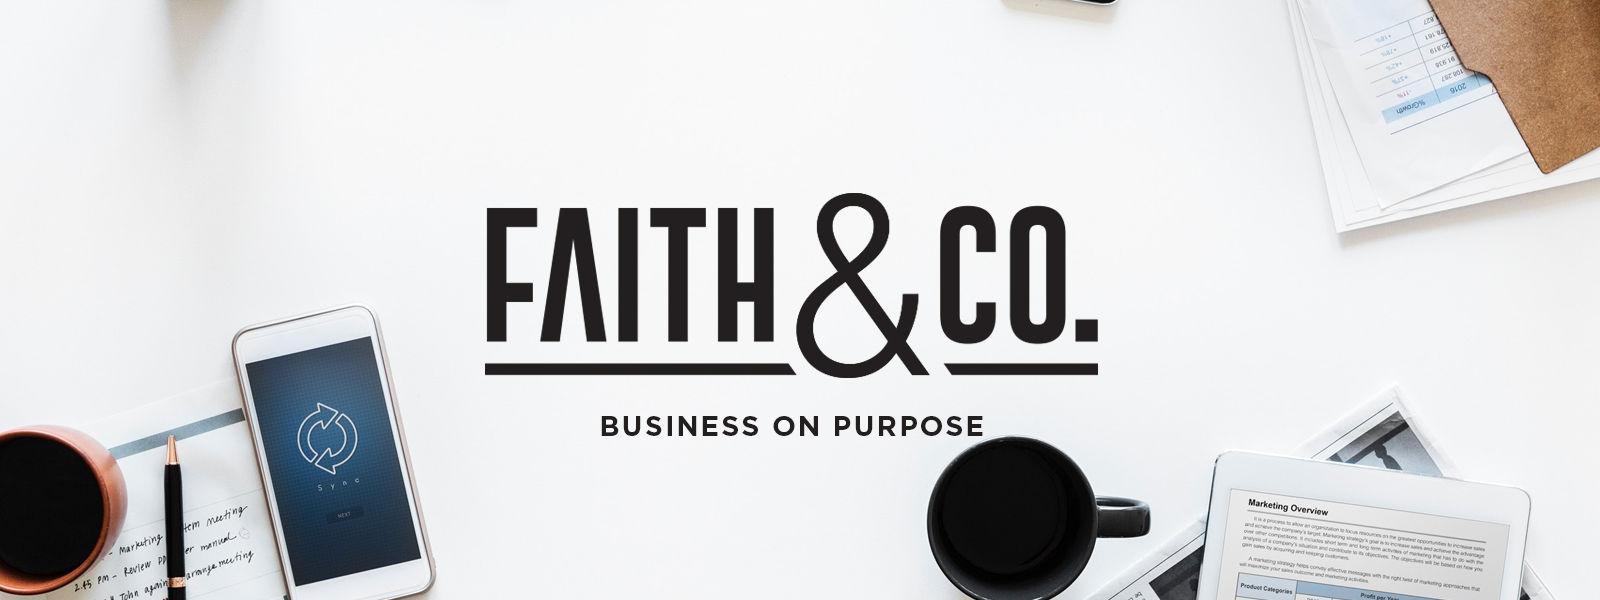 Faith & Co: Business on Purpose